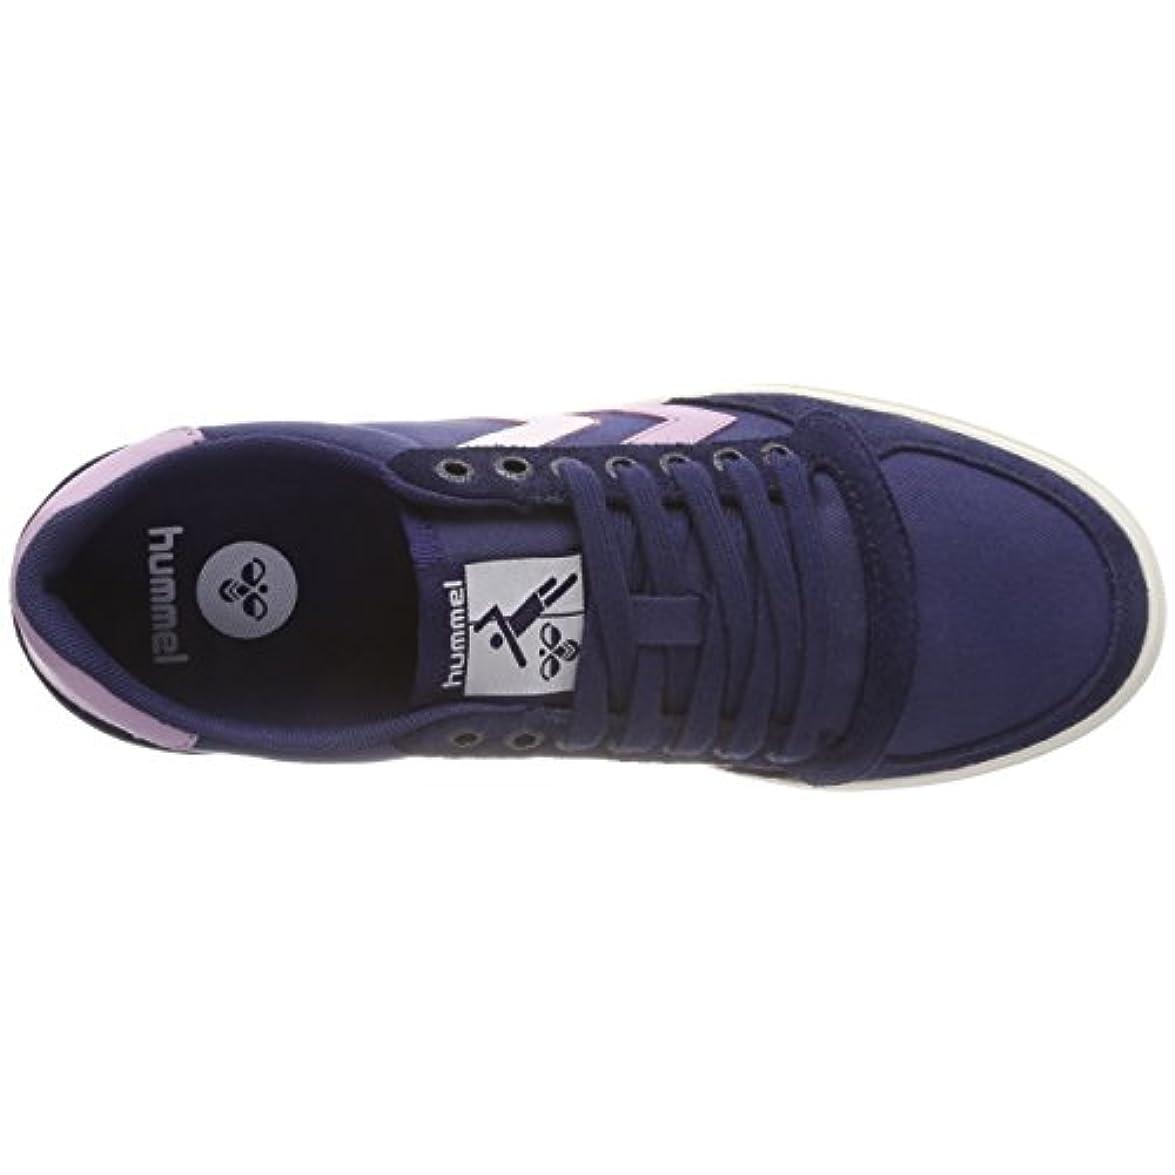 Hummel Slimmer Stadil Duo Canvas Low Sneaker Donna Blu peacoat lavernder Mist 8679 36 Eu